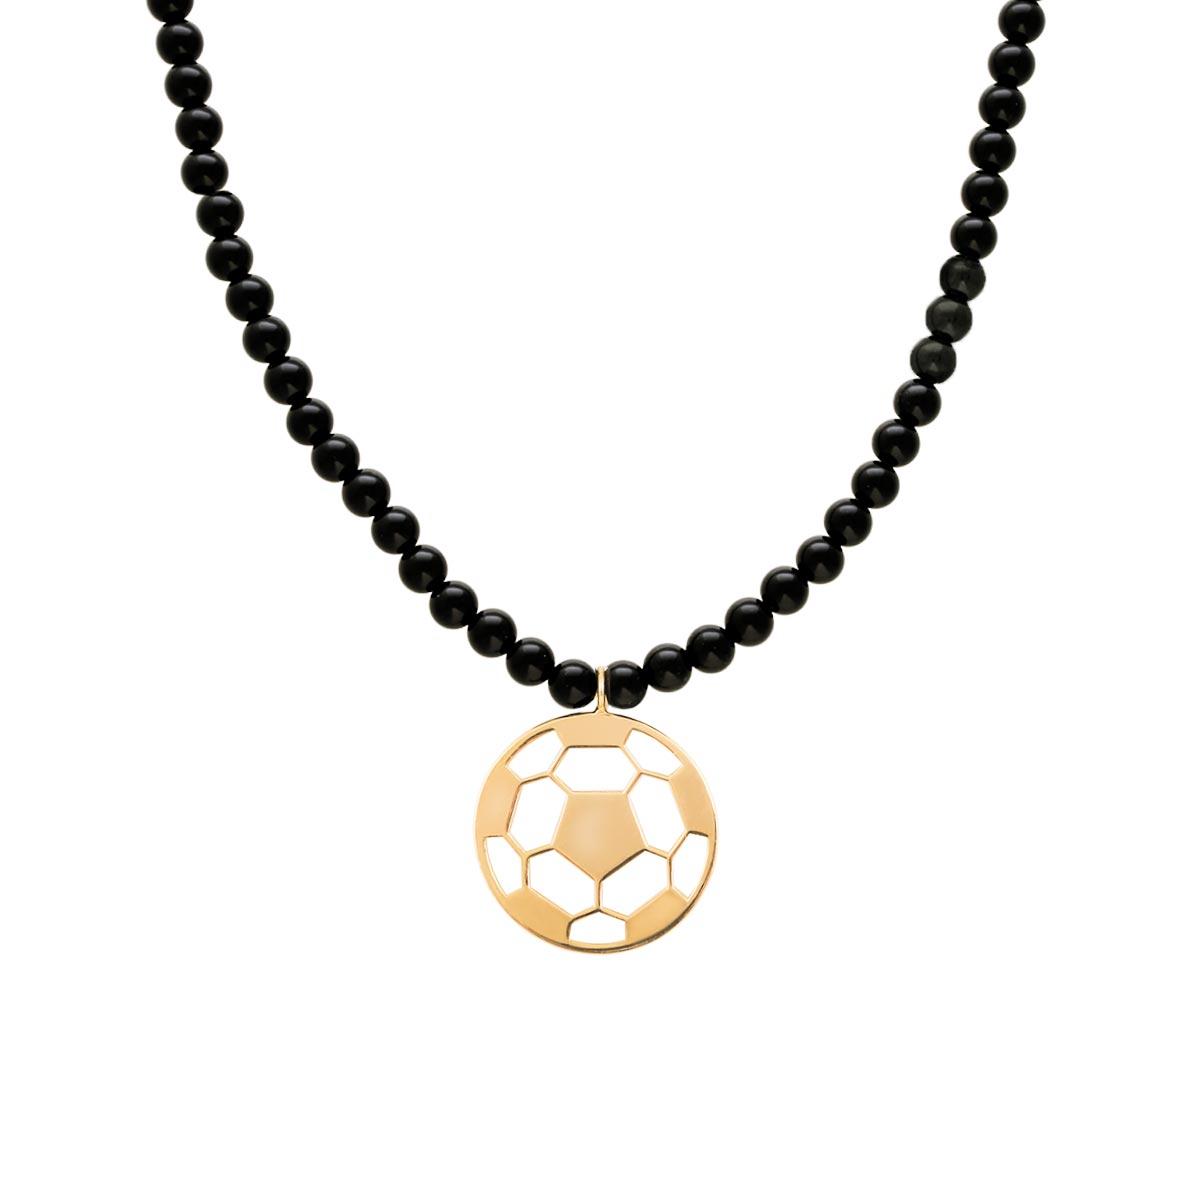 پرسته گردنبند طلا توپ فوتبال